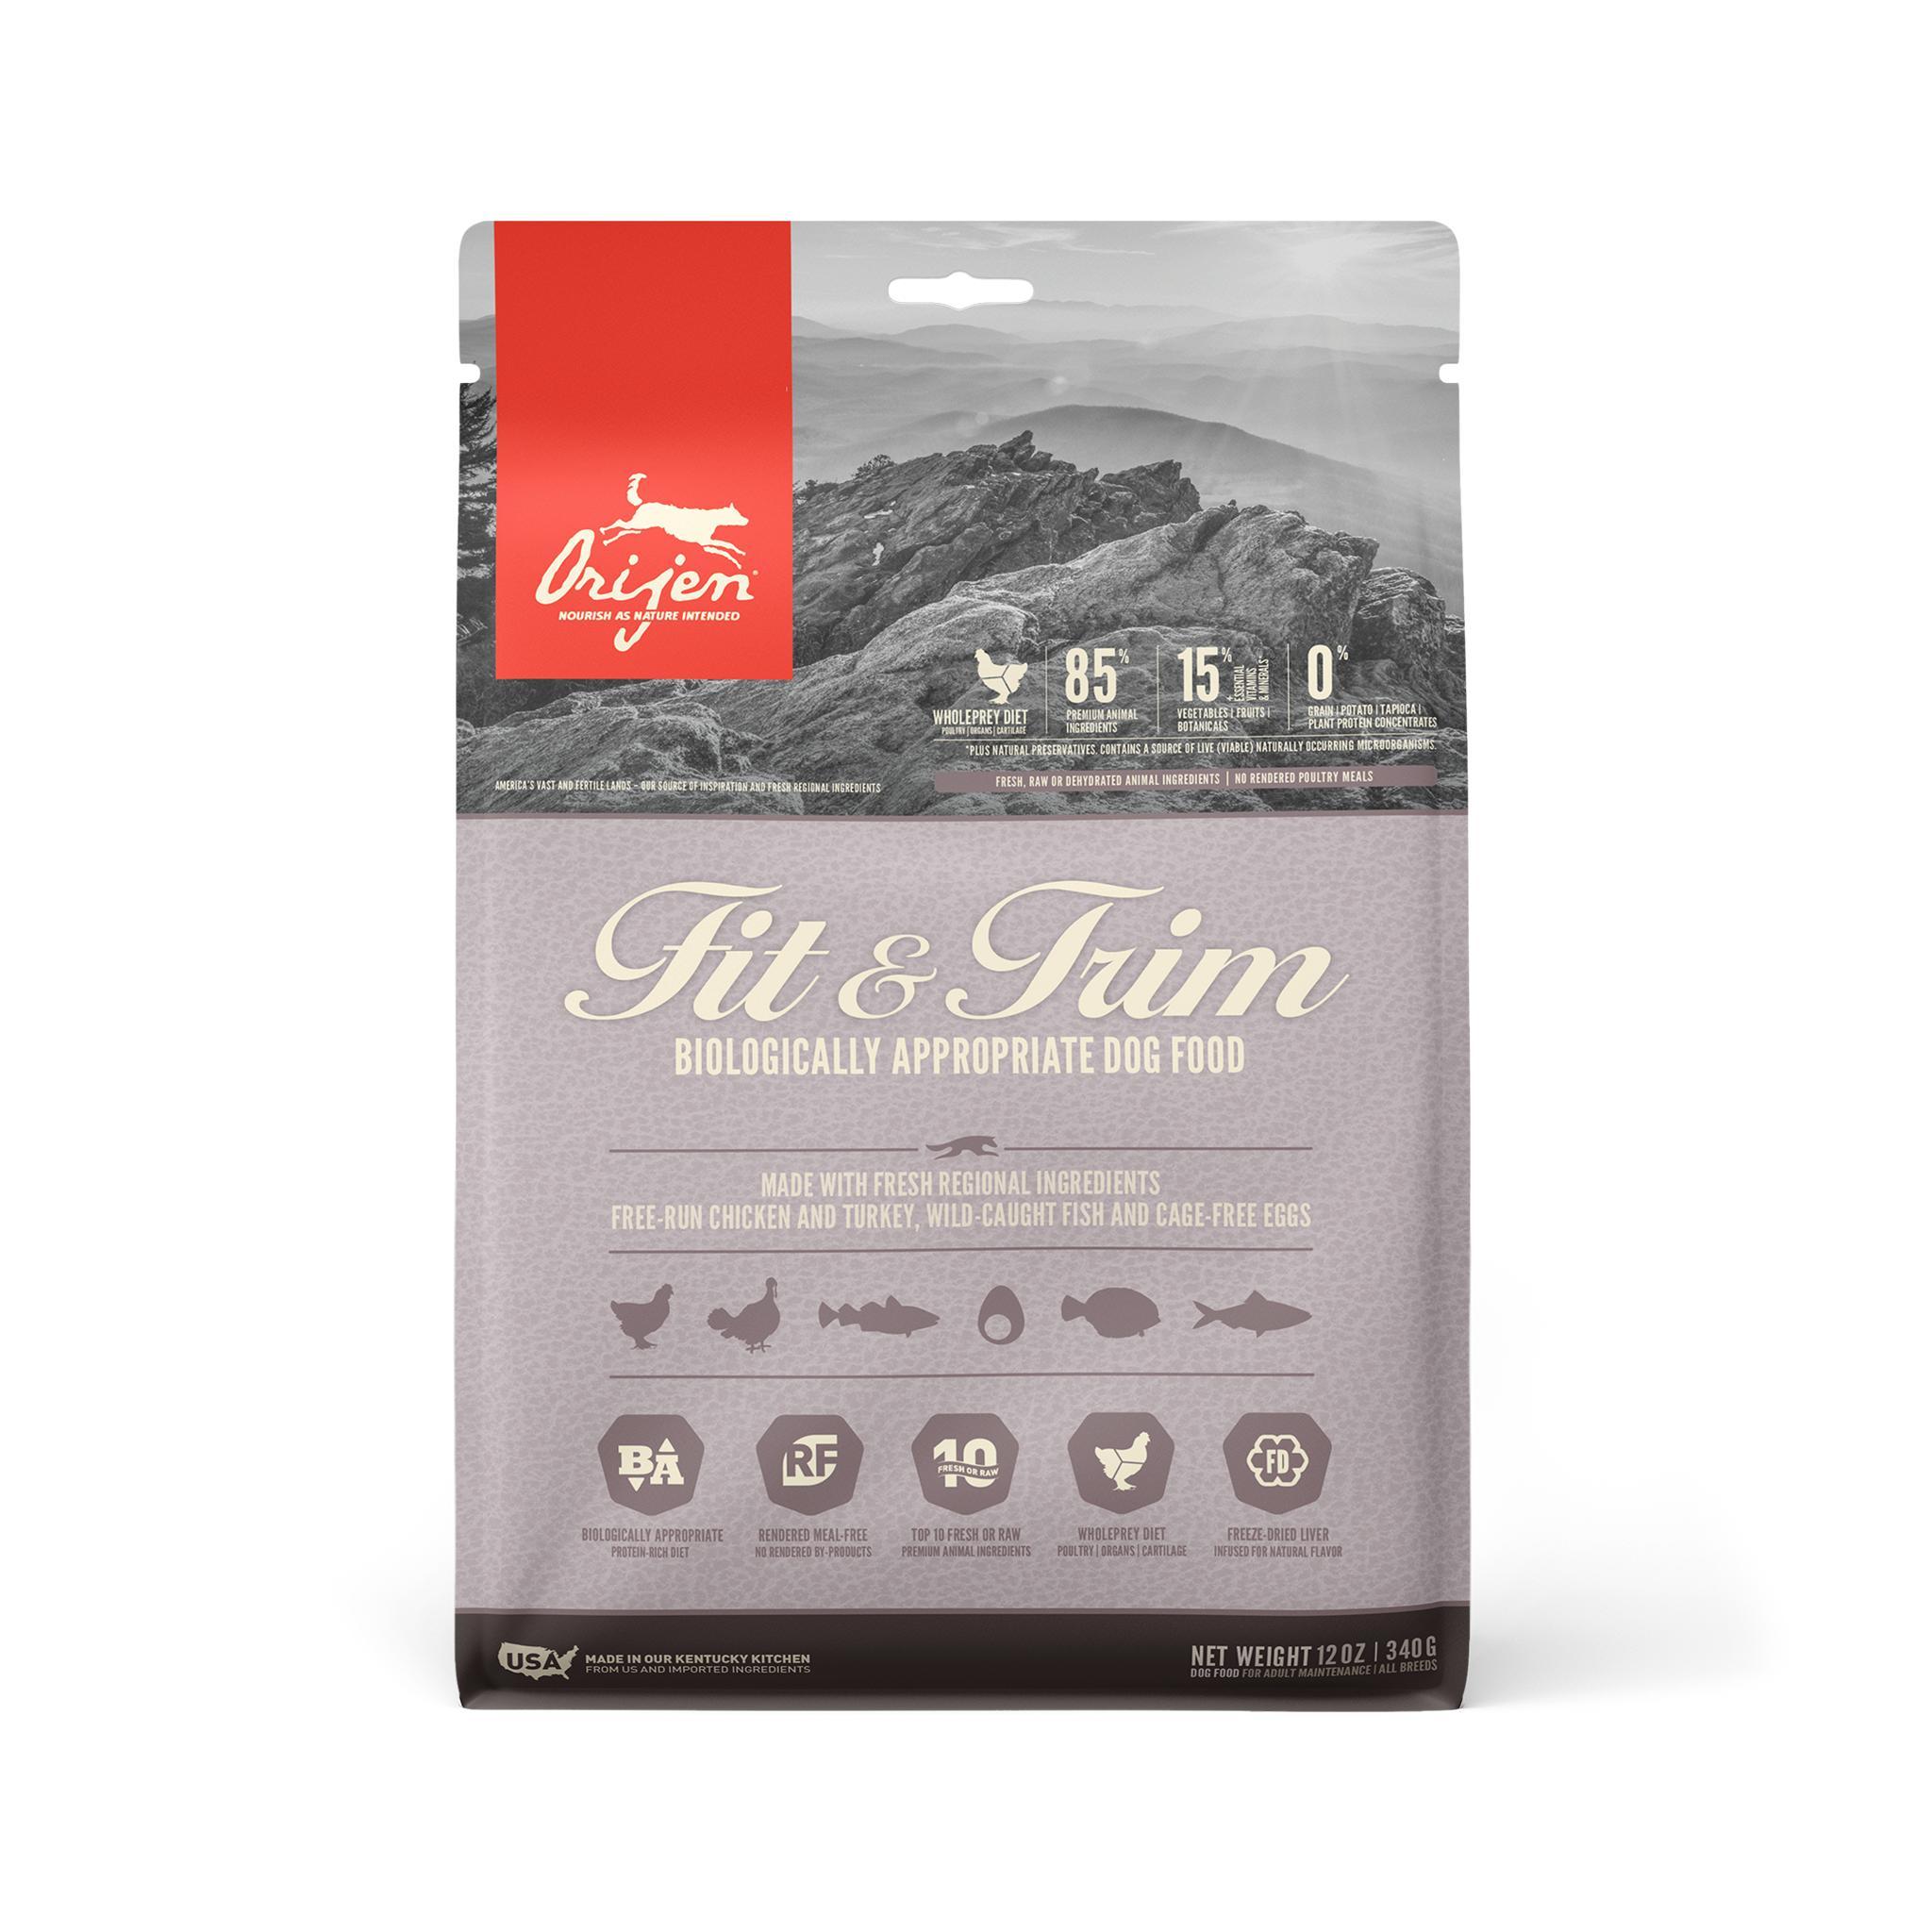 ORIJEN Fit & Trim Grain-Free Dry Dog Food Image